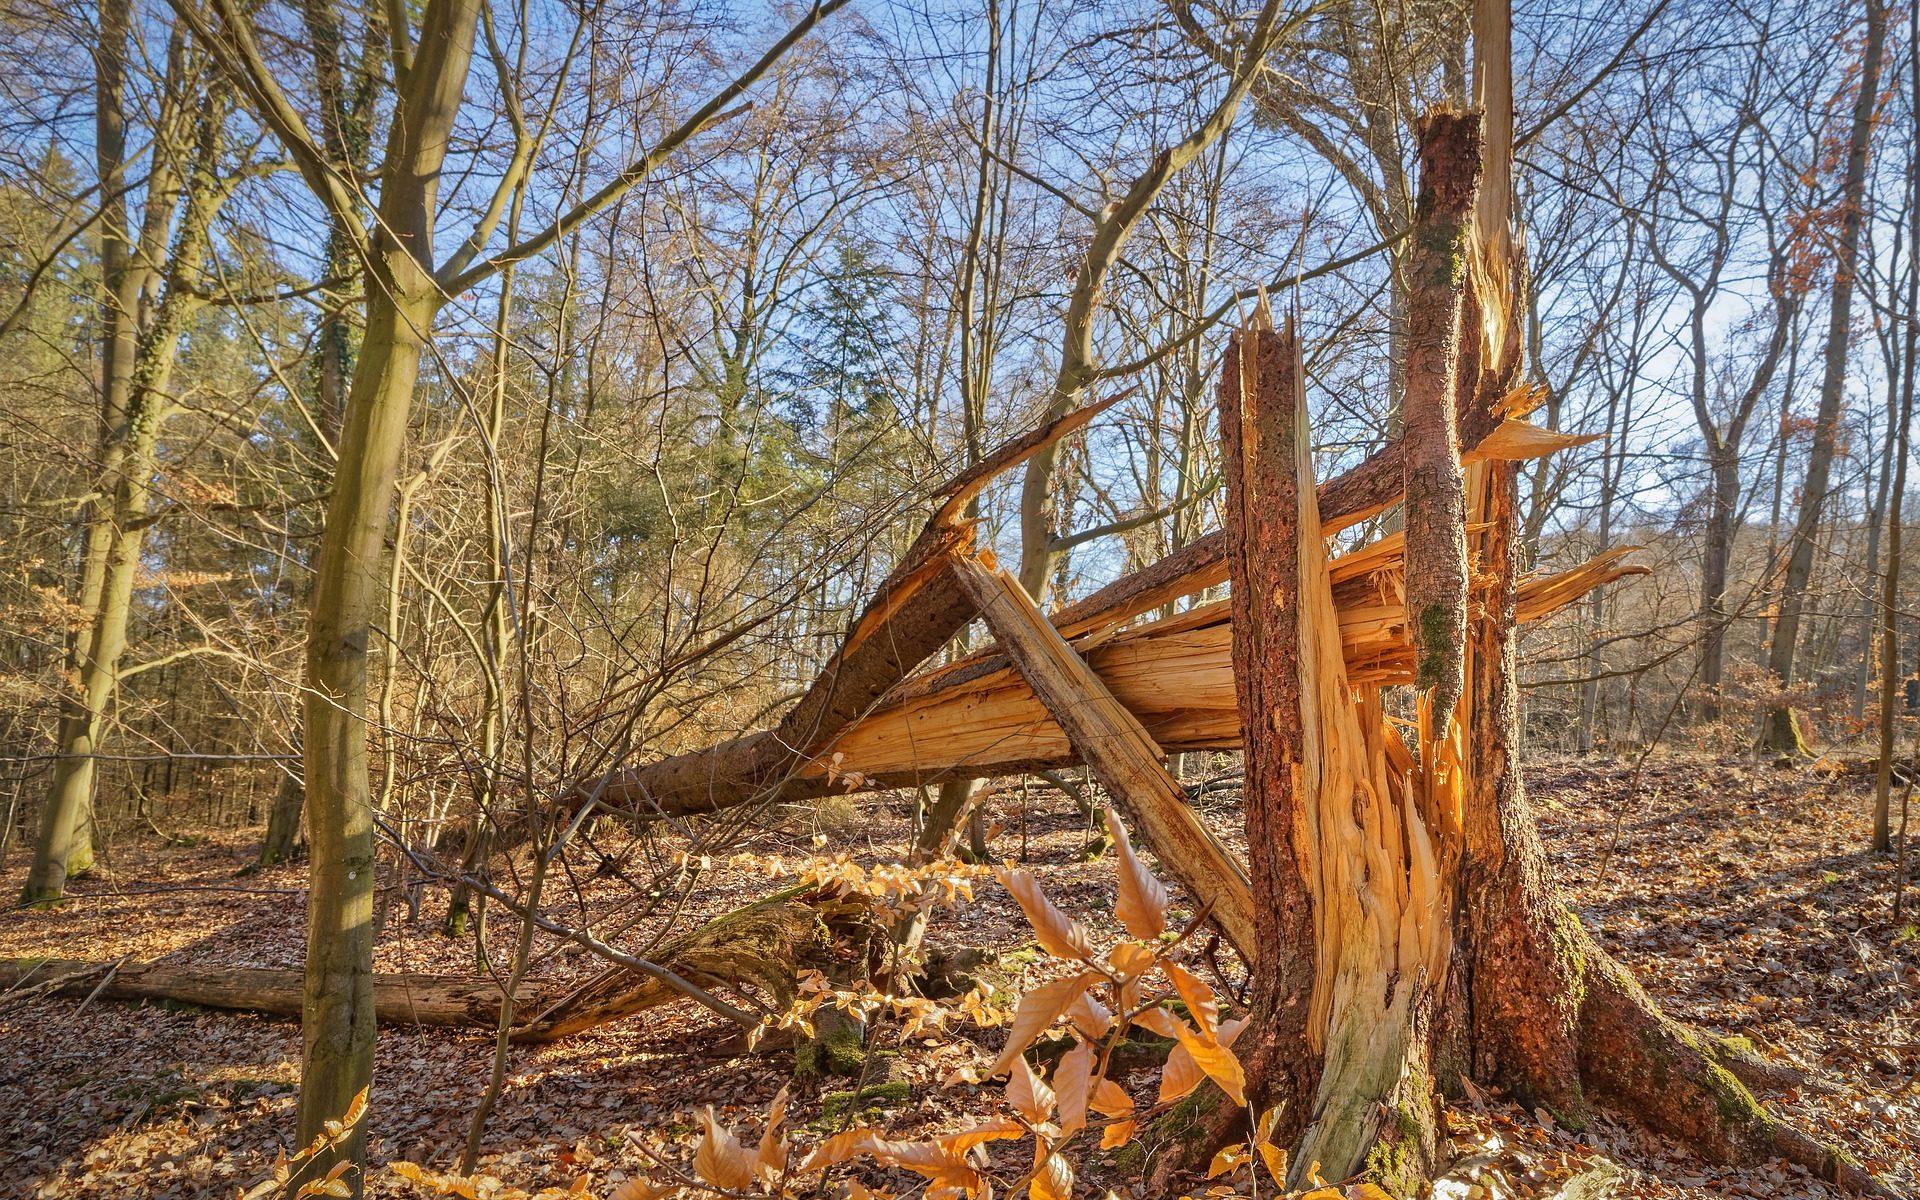 Picture of fallen tree